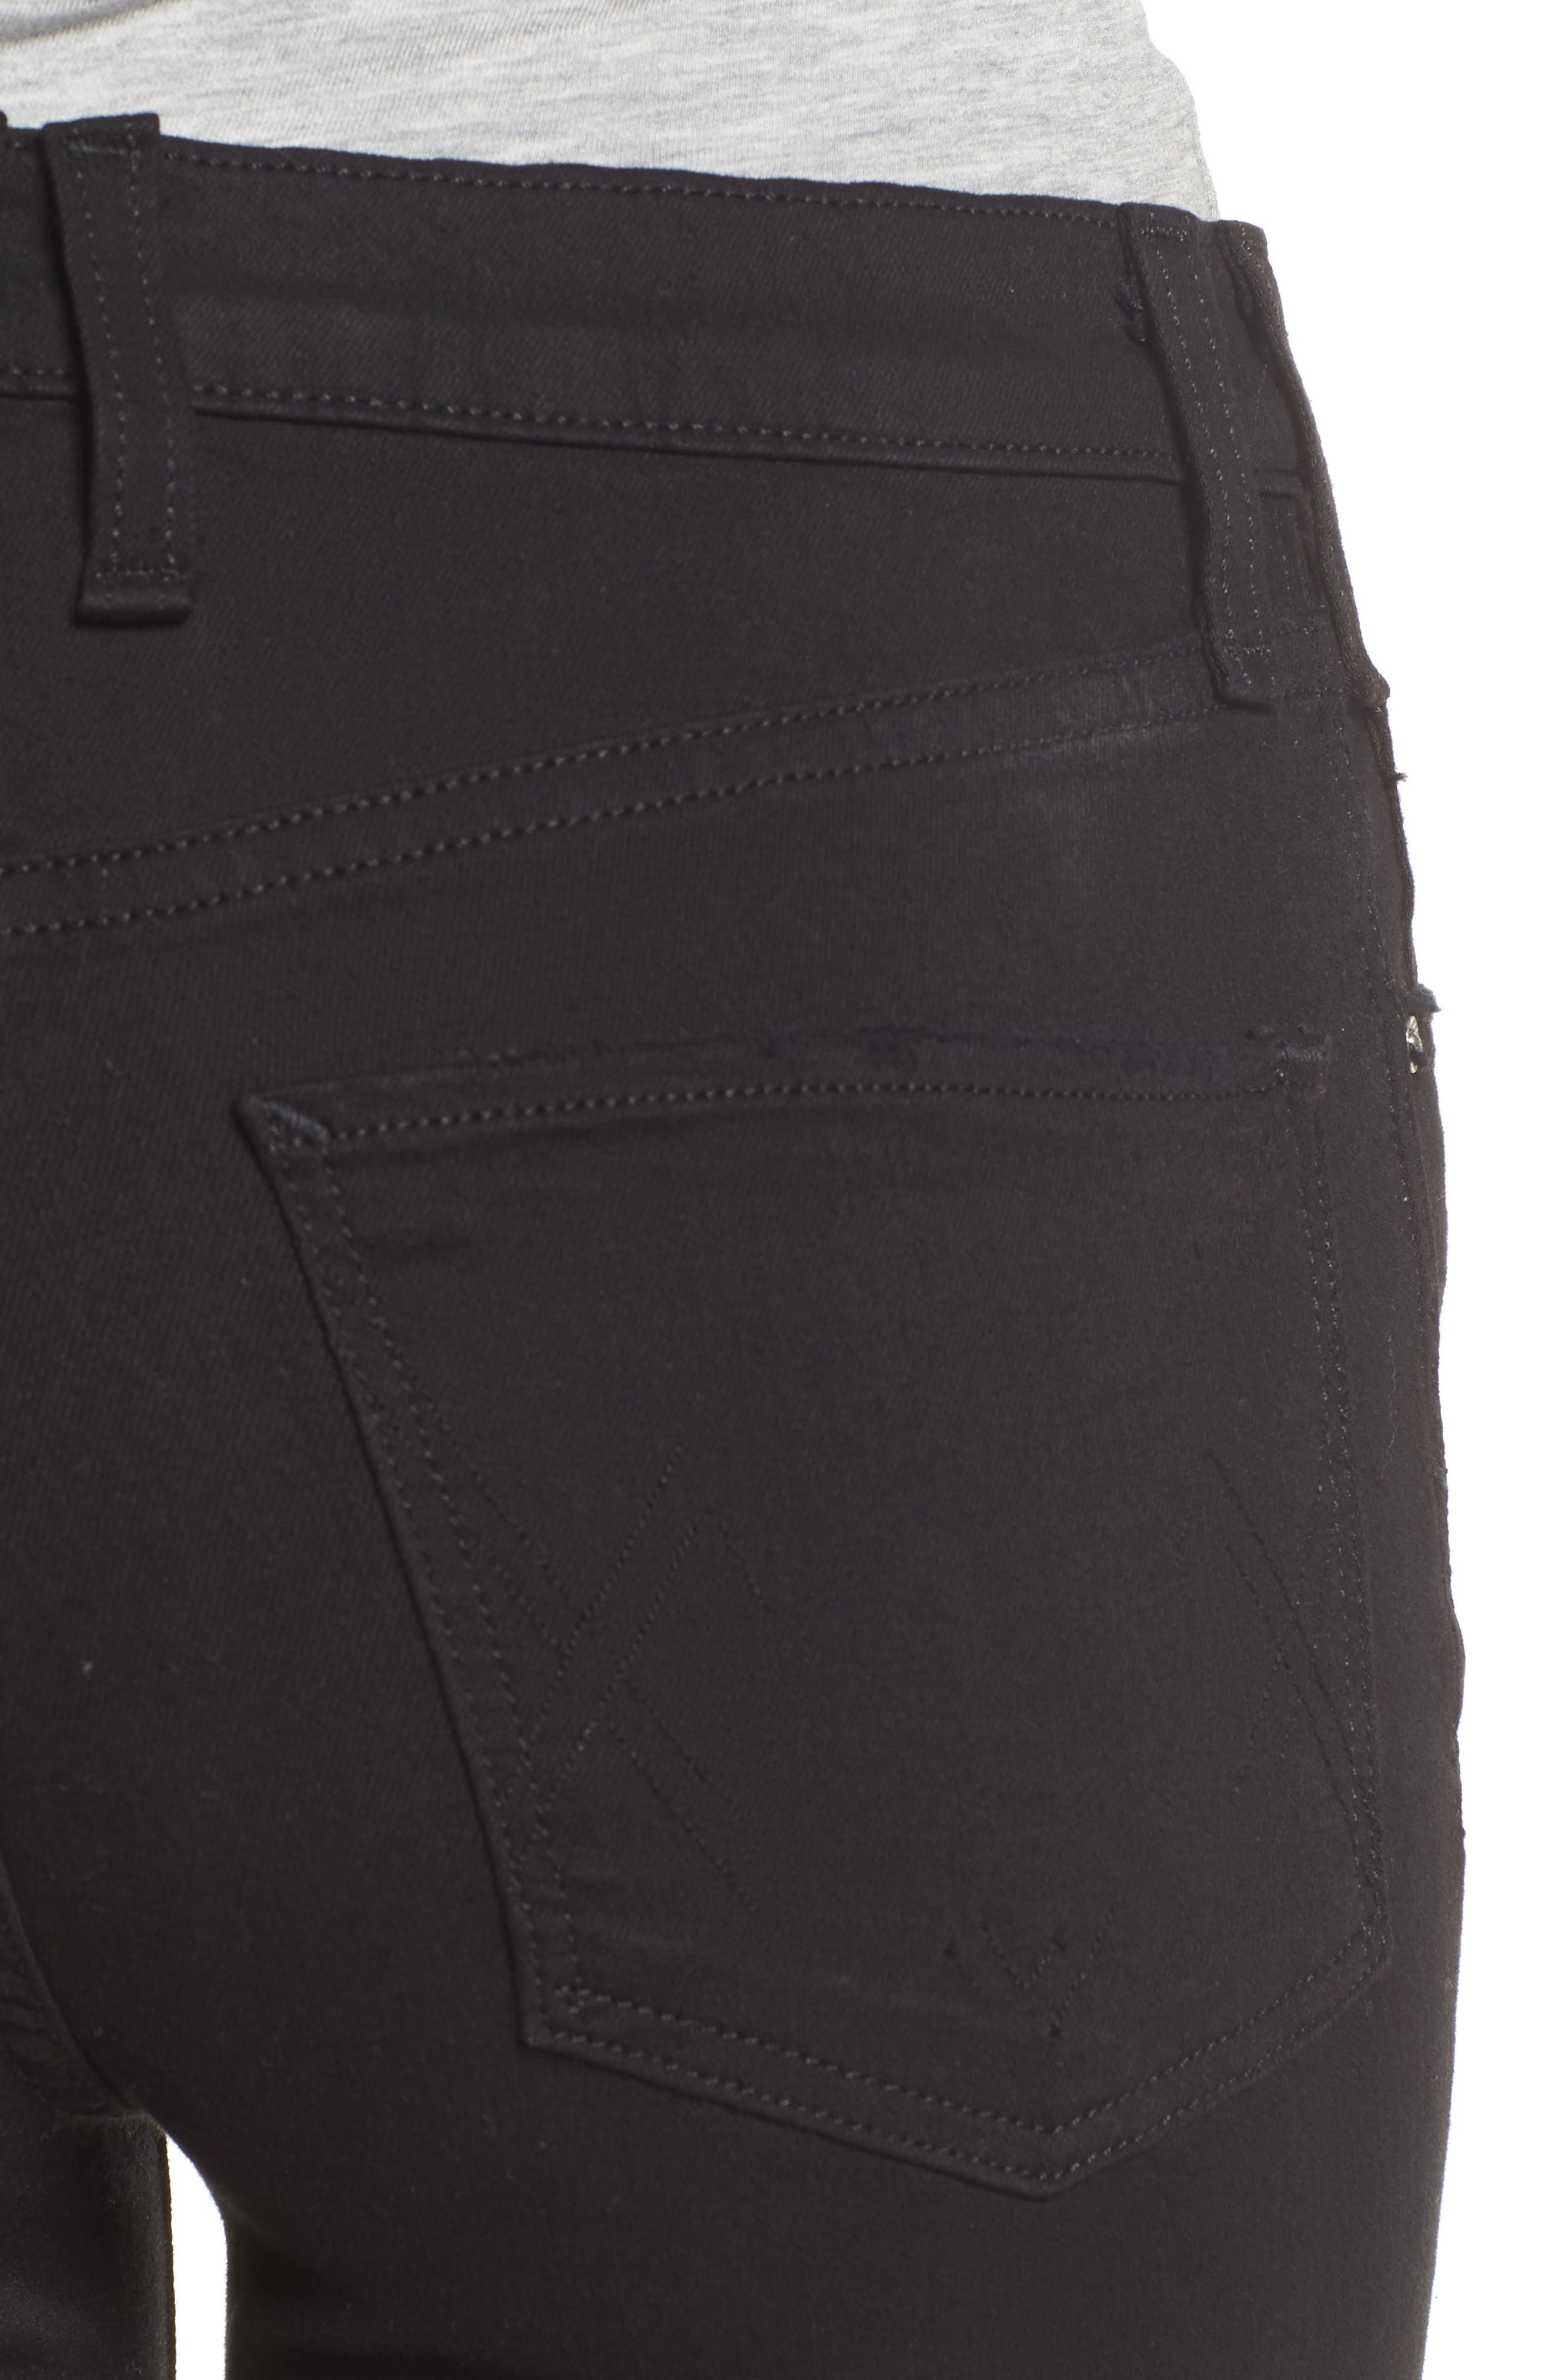 Alternate Image 4  - McGuire Newton High Waist Ankle Skinny Jeans (Reposado)